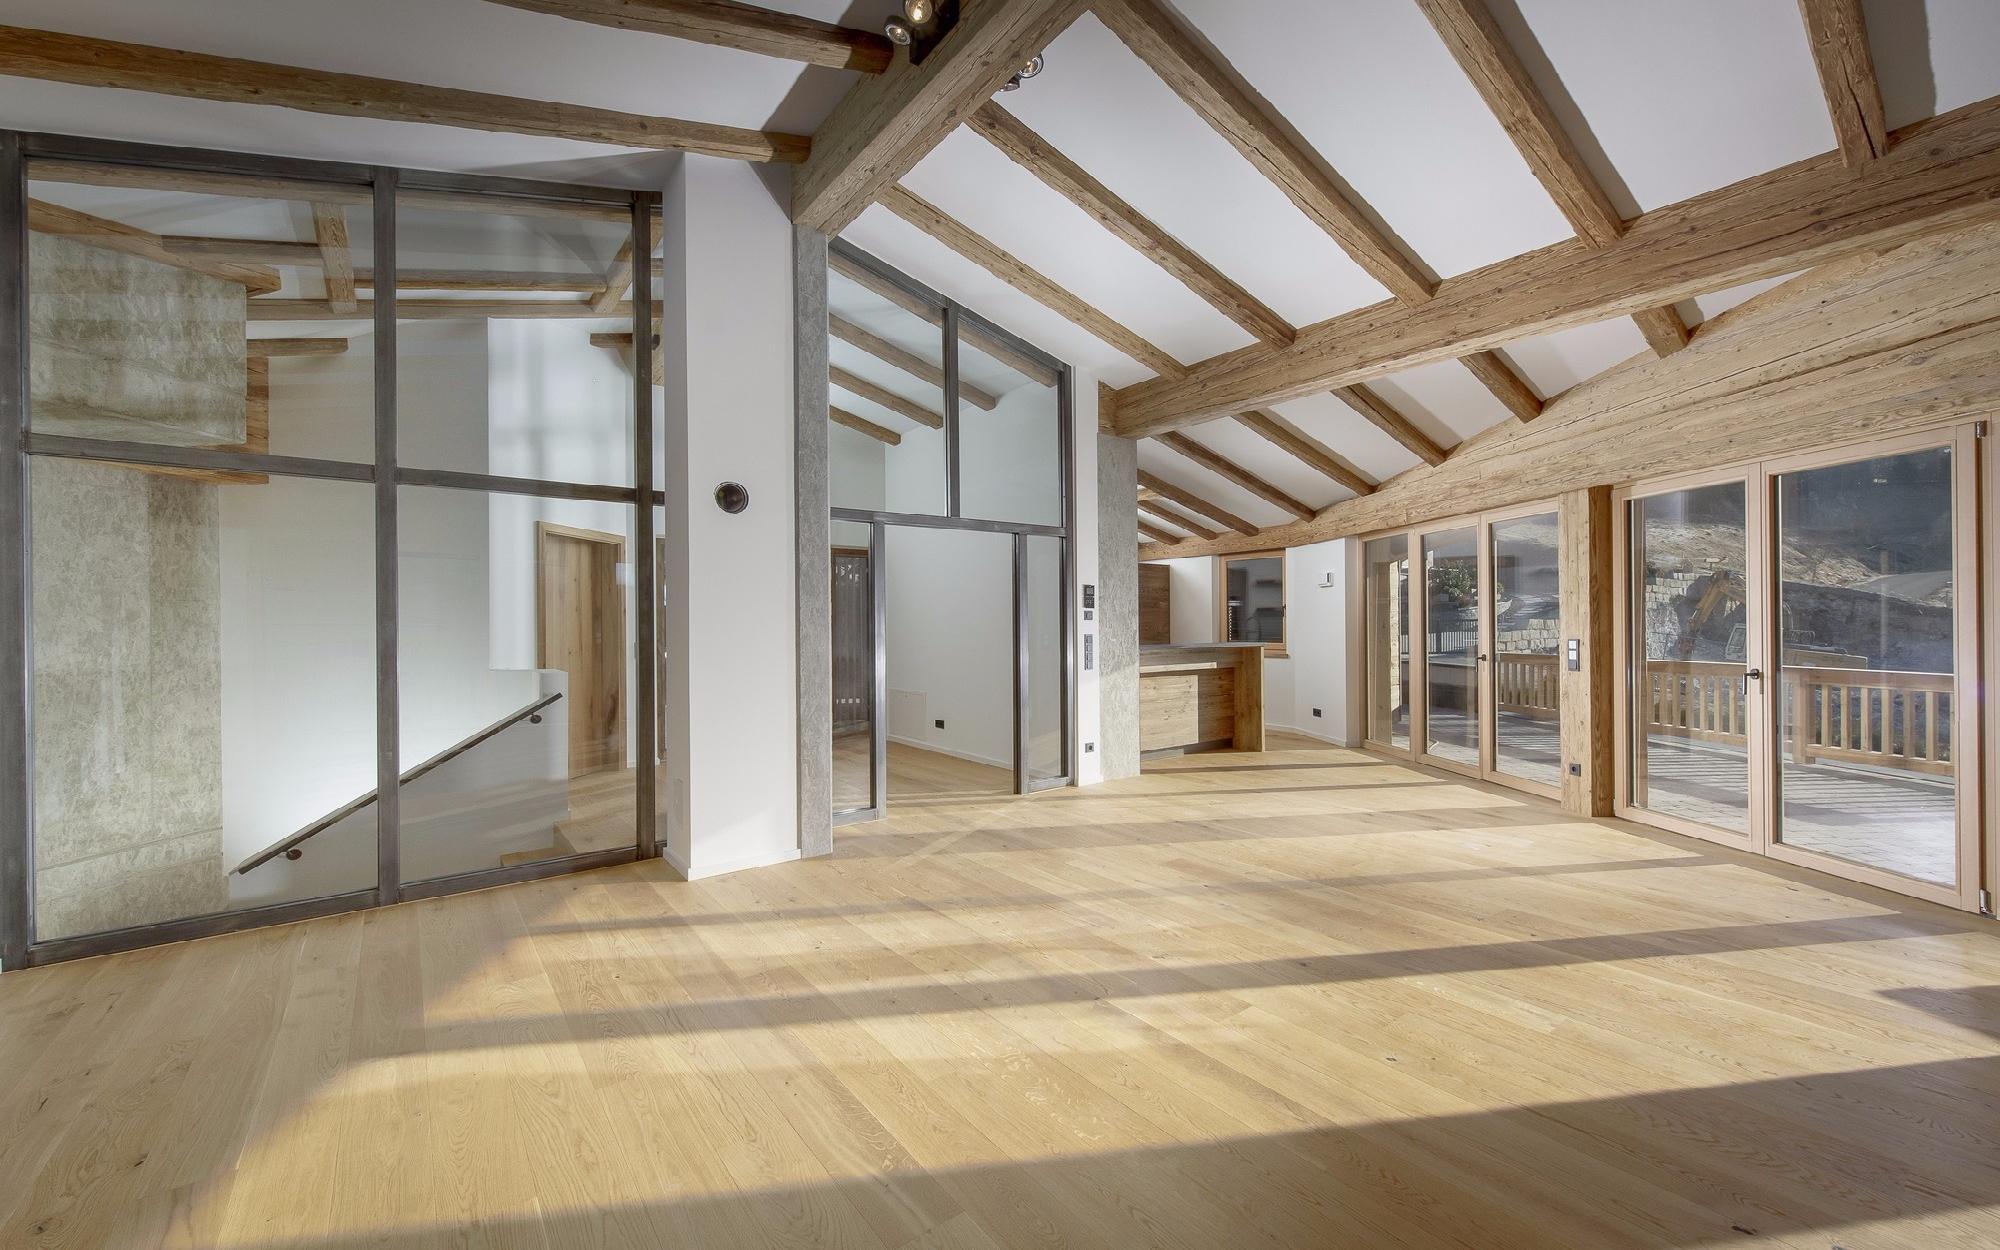 Immobilien - Sonniges Neubauchalet in Kitzbühel, Kitzbuehel